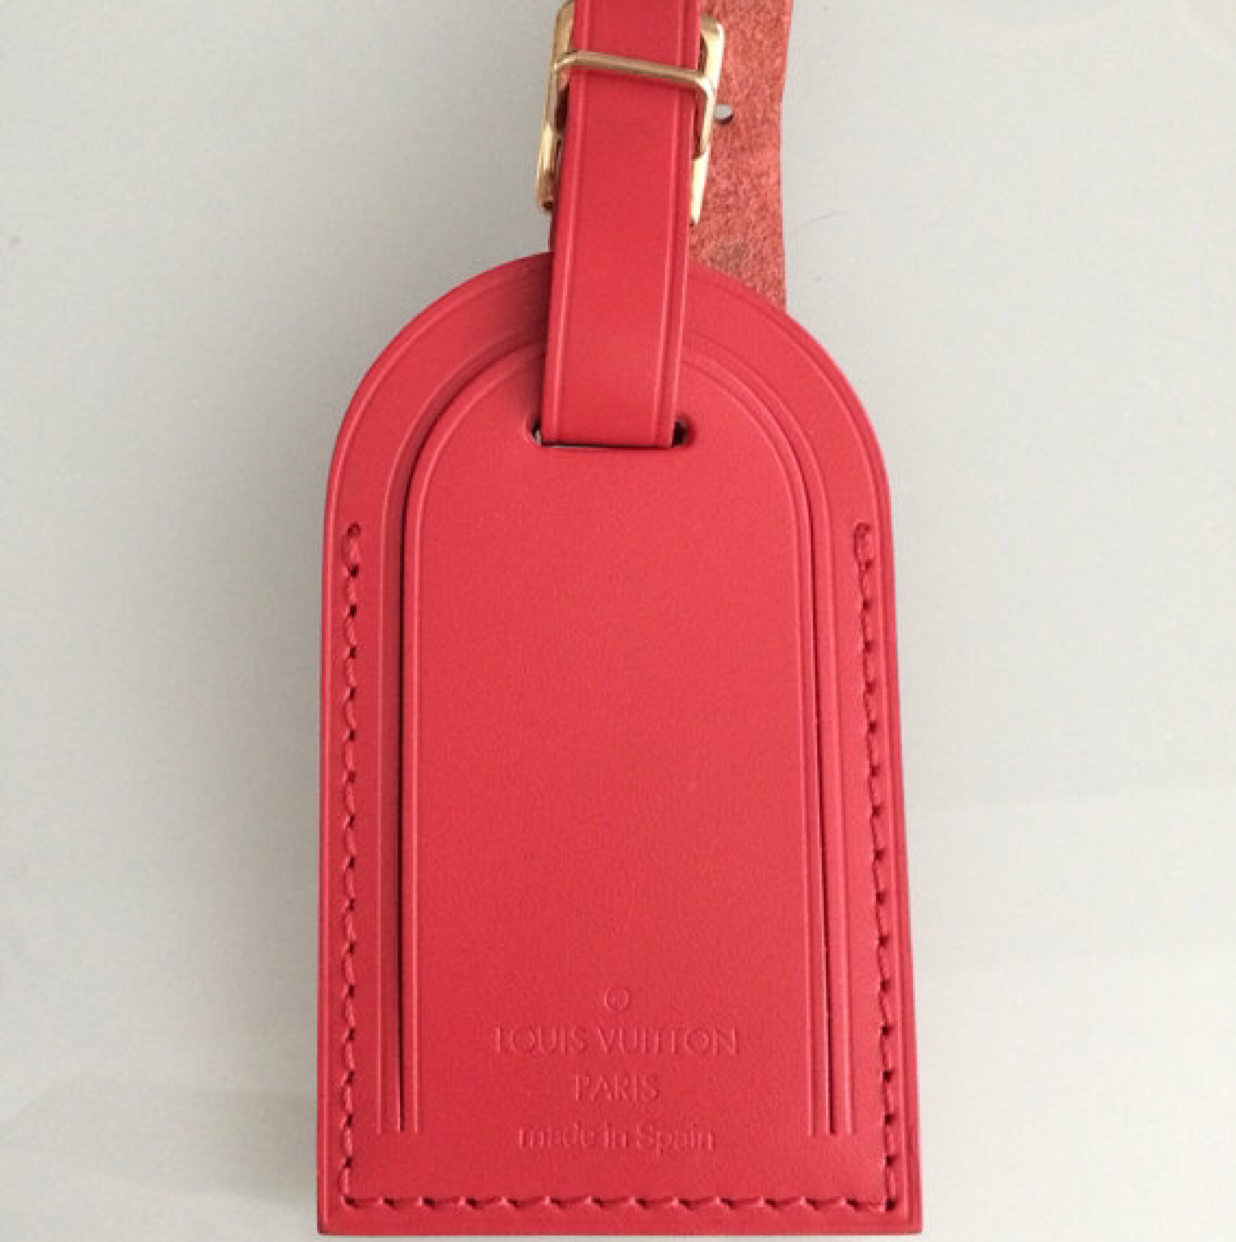 ee41598ac06 ShopandBox - Buy Louis Vuitton Luggage tag from HK